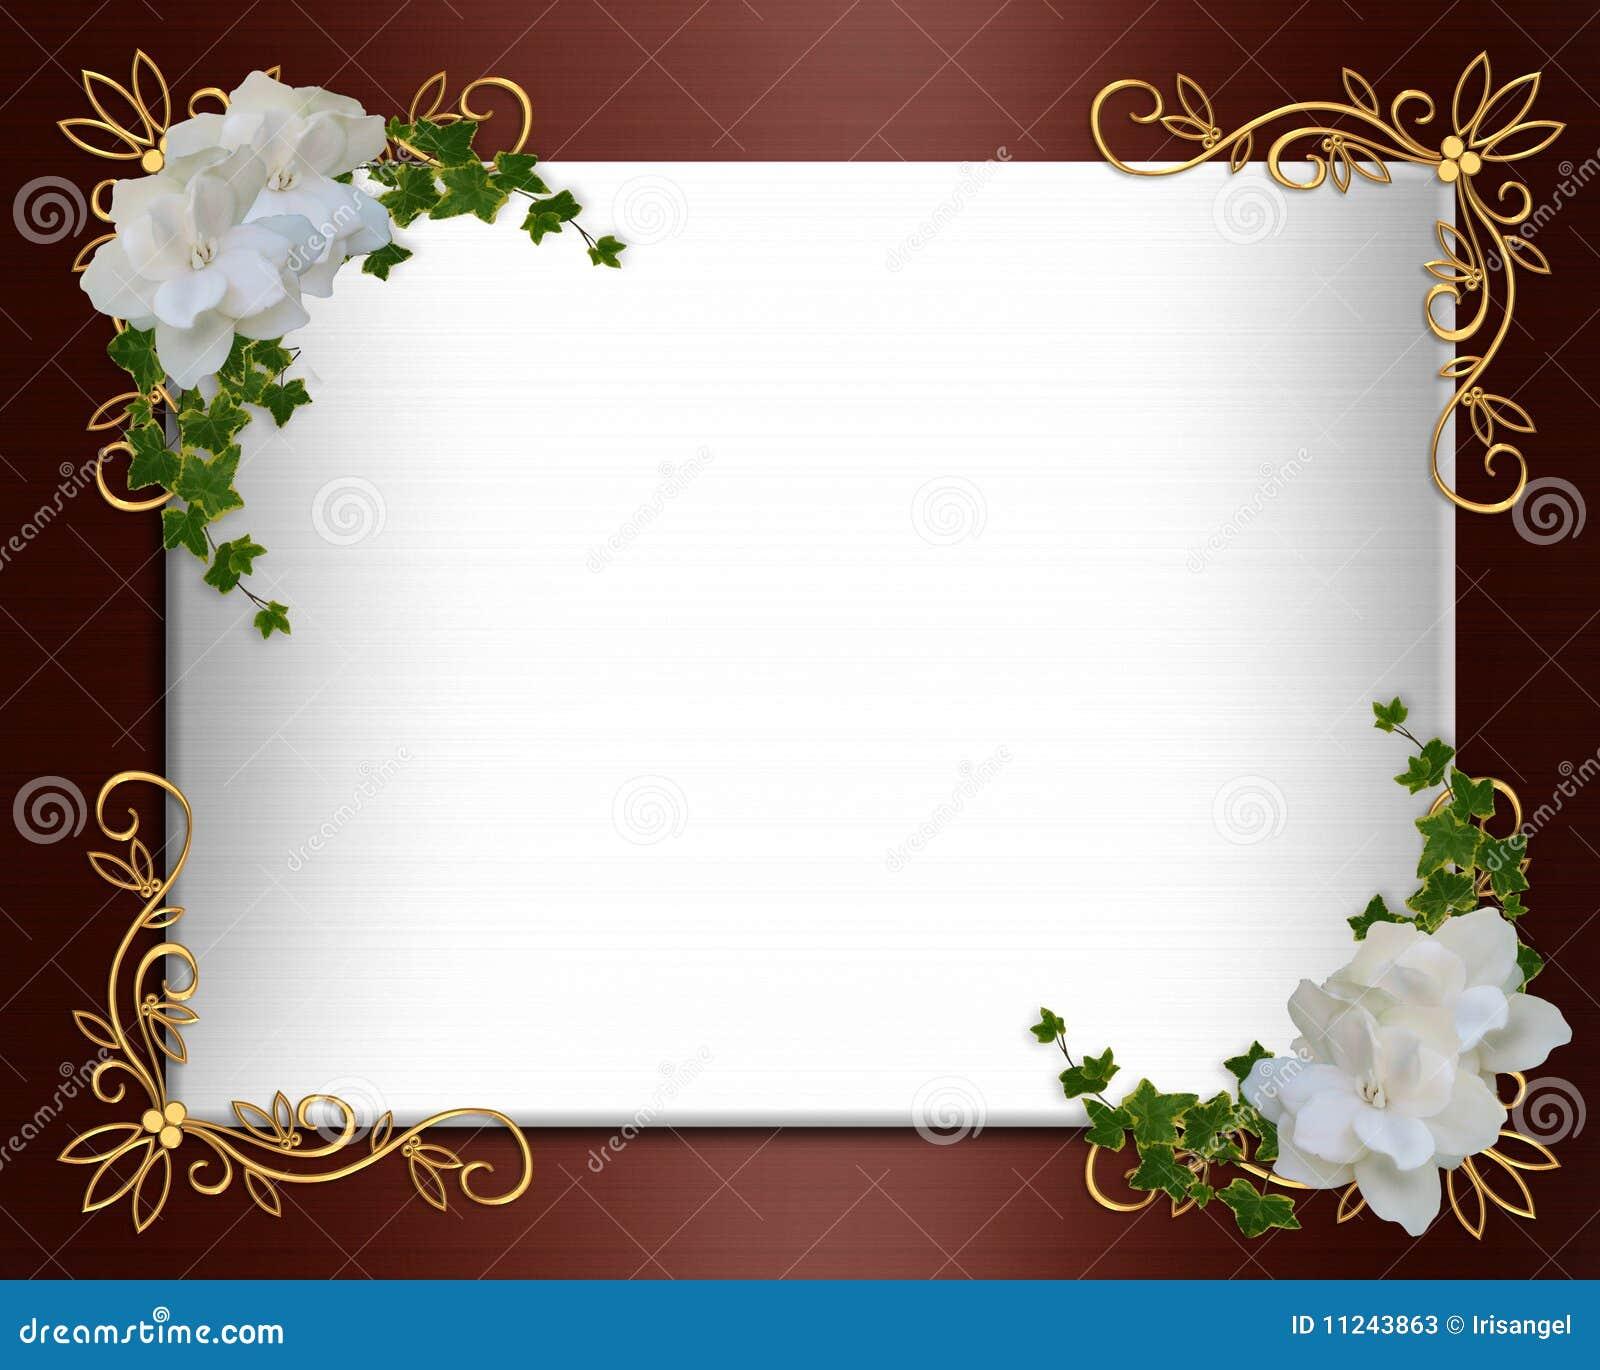 Wedding Invitation Border Elegant Stock Photos - Image: 11243863